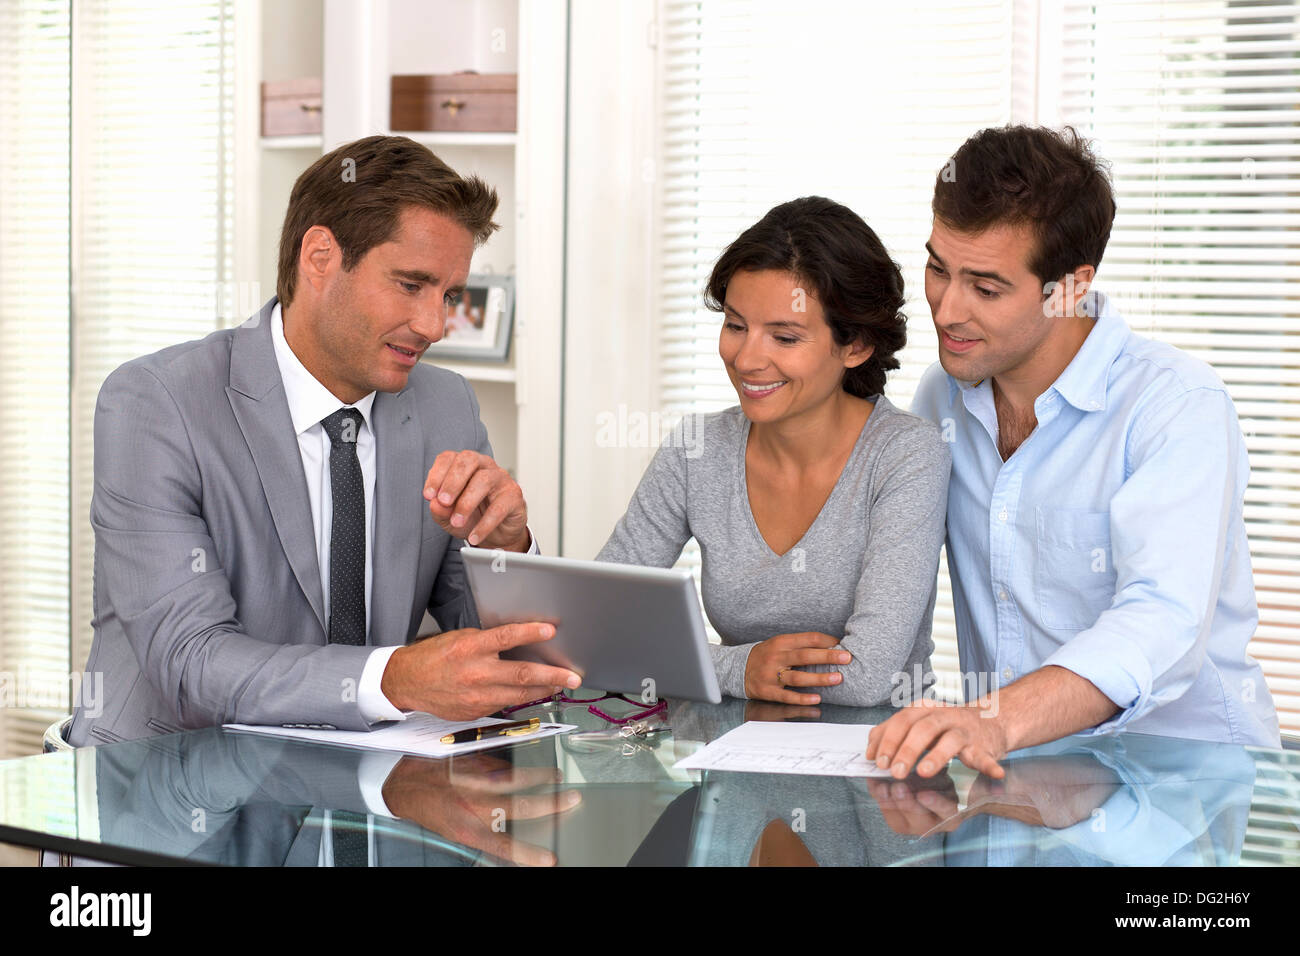 woman man businessman tablet pc indoor contrat - Stock Image